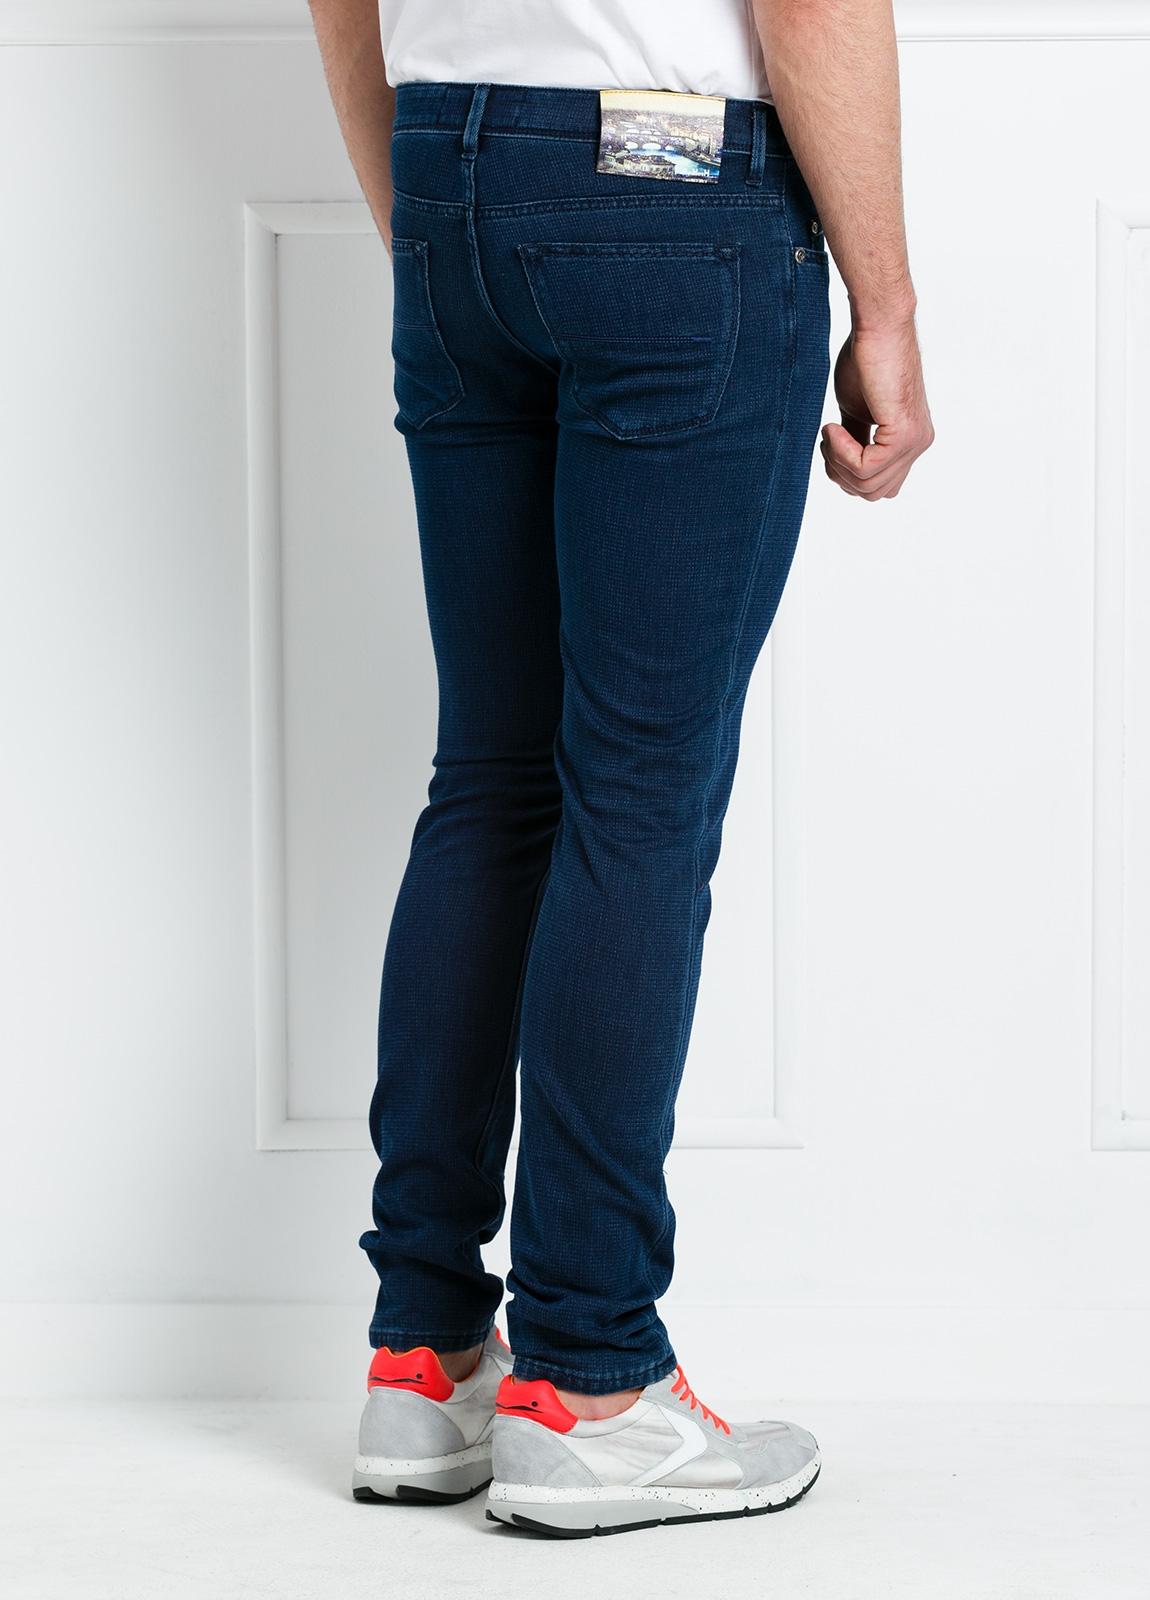 Pantalón sport slim fit modelo RUBENS P015 color azul oscuro. 57% Algodón 40% Poliéster 3% Elastáno. - Ítem1